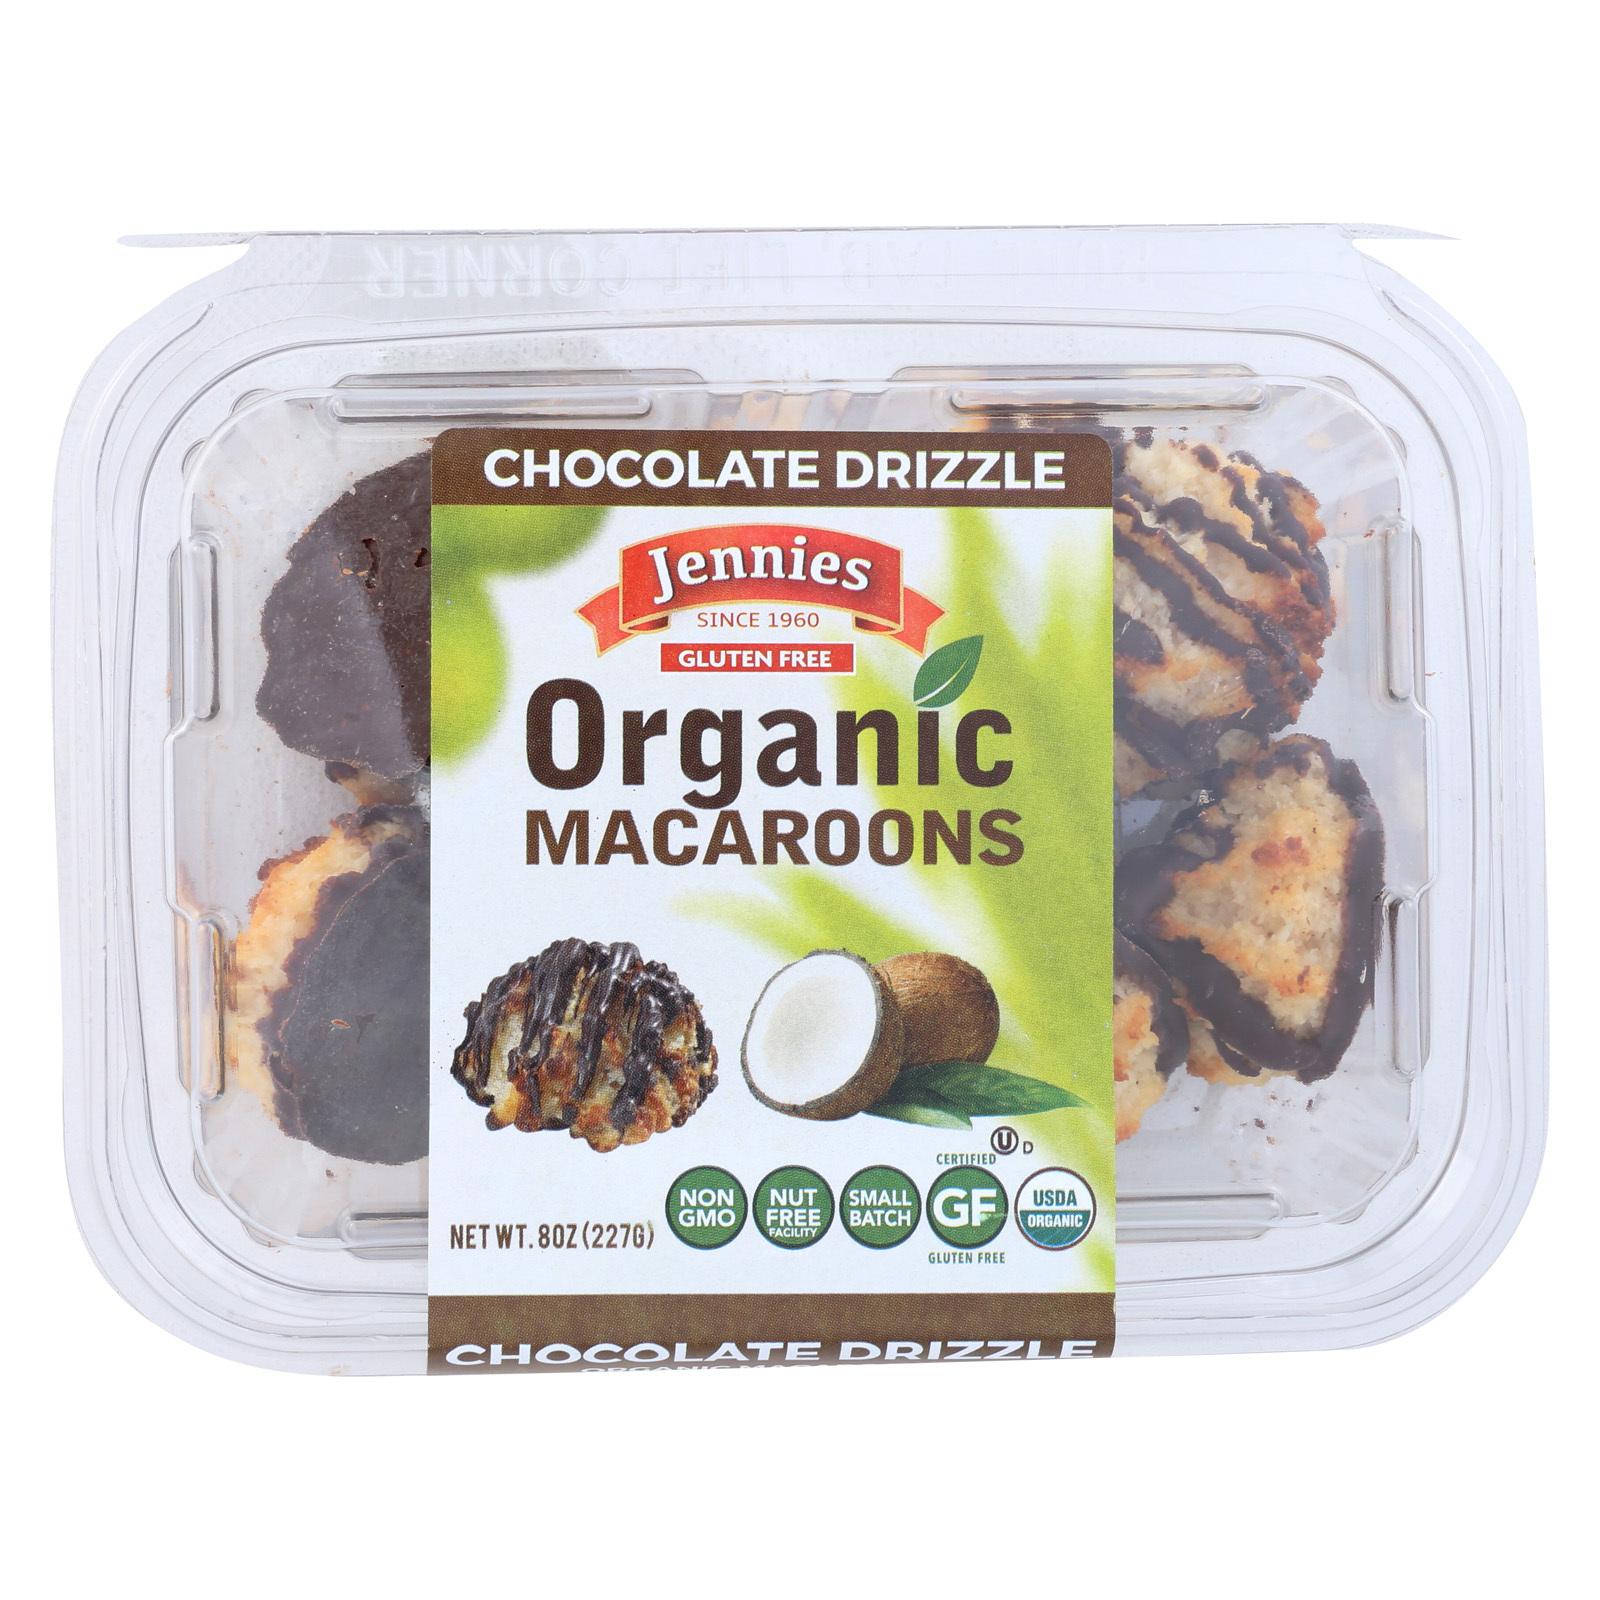 Jennie's Organic Macaroon - Chocolate Drizzle - Case of 12 - 8 oz.